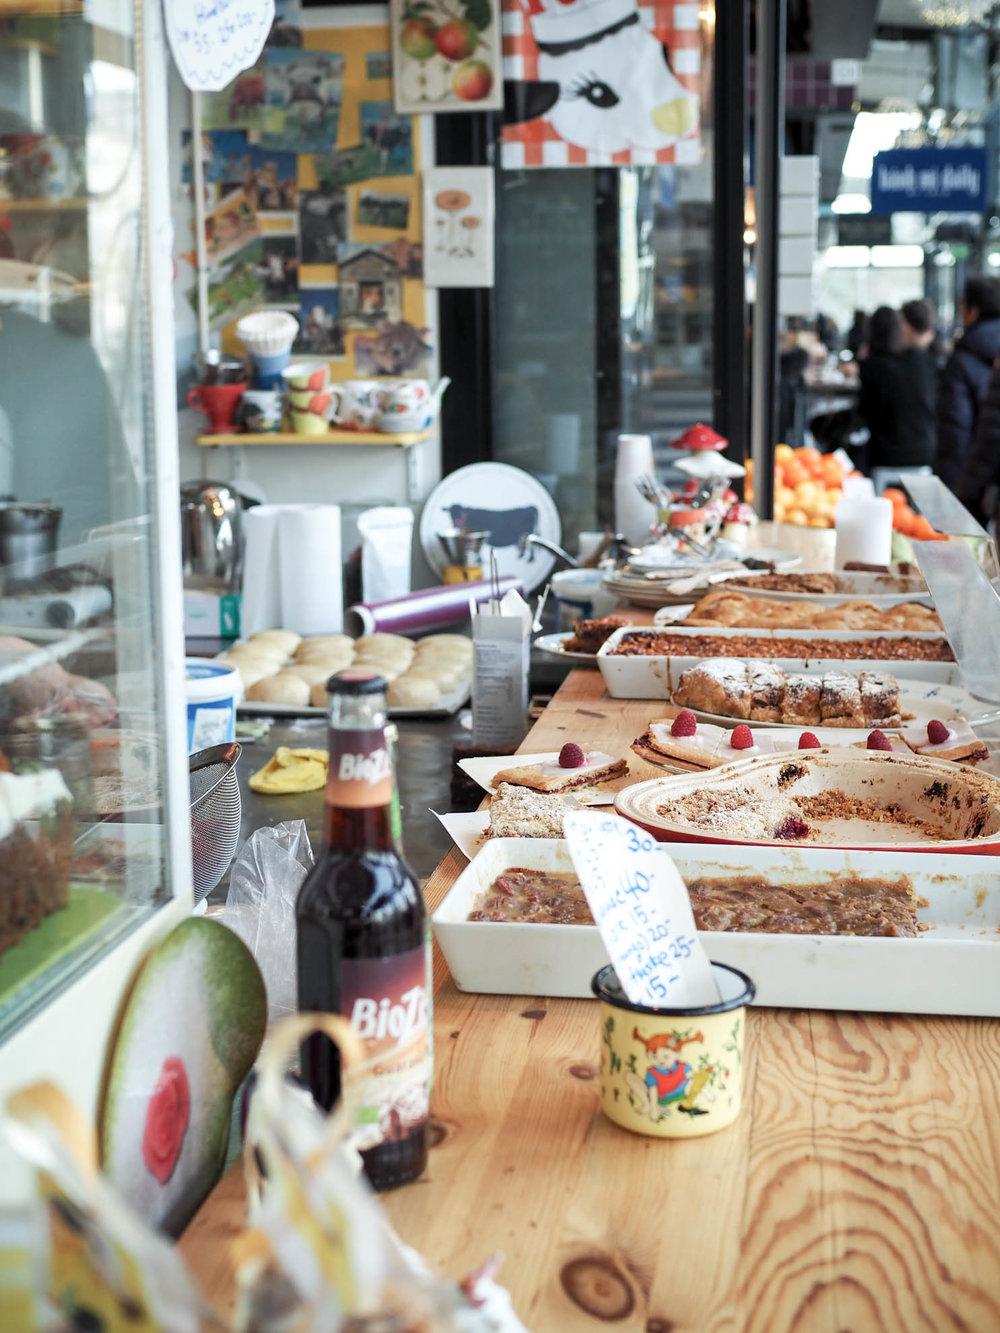 Lots of dessert at Rosa Bakery in Torvehallarne